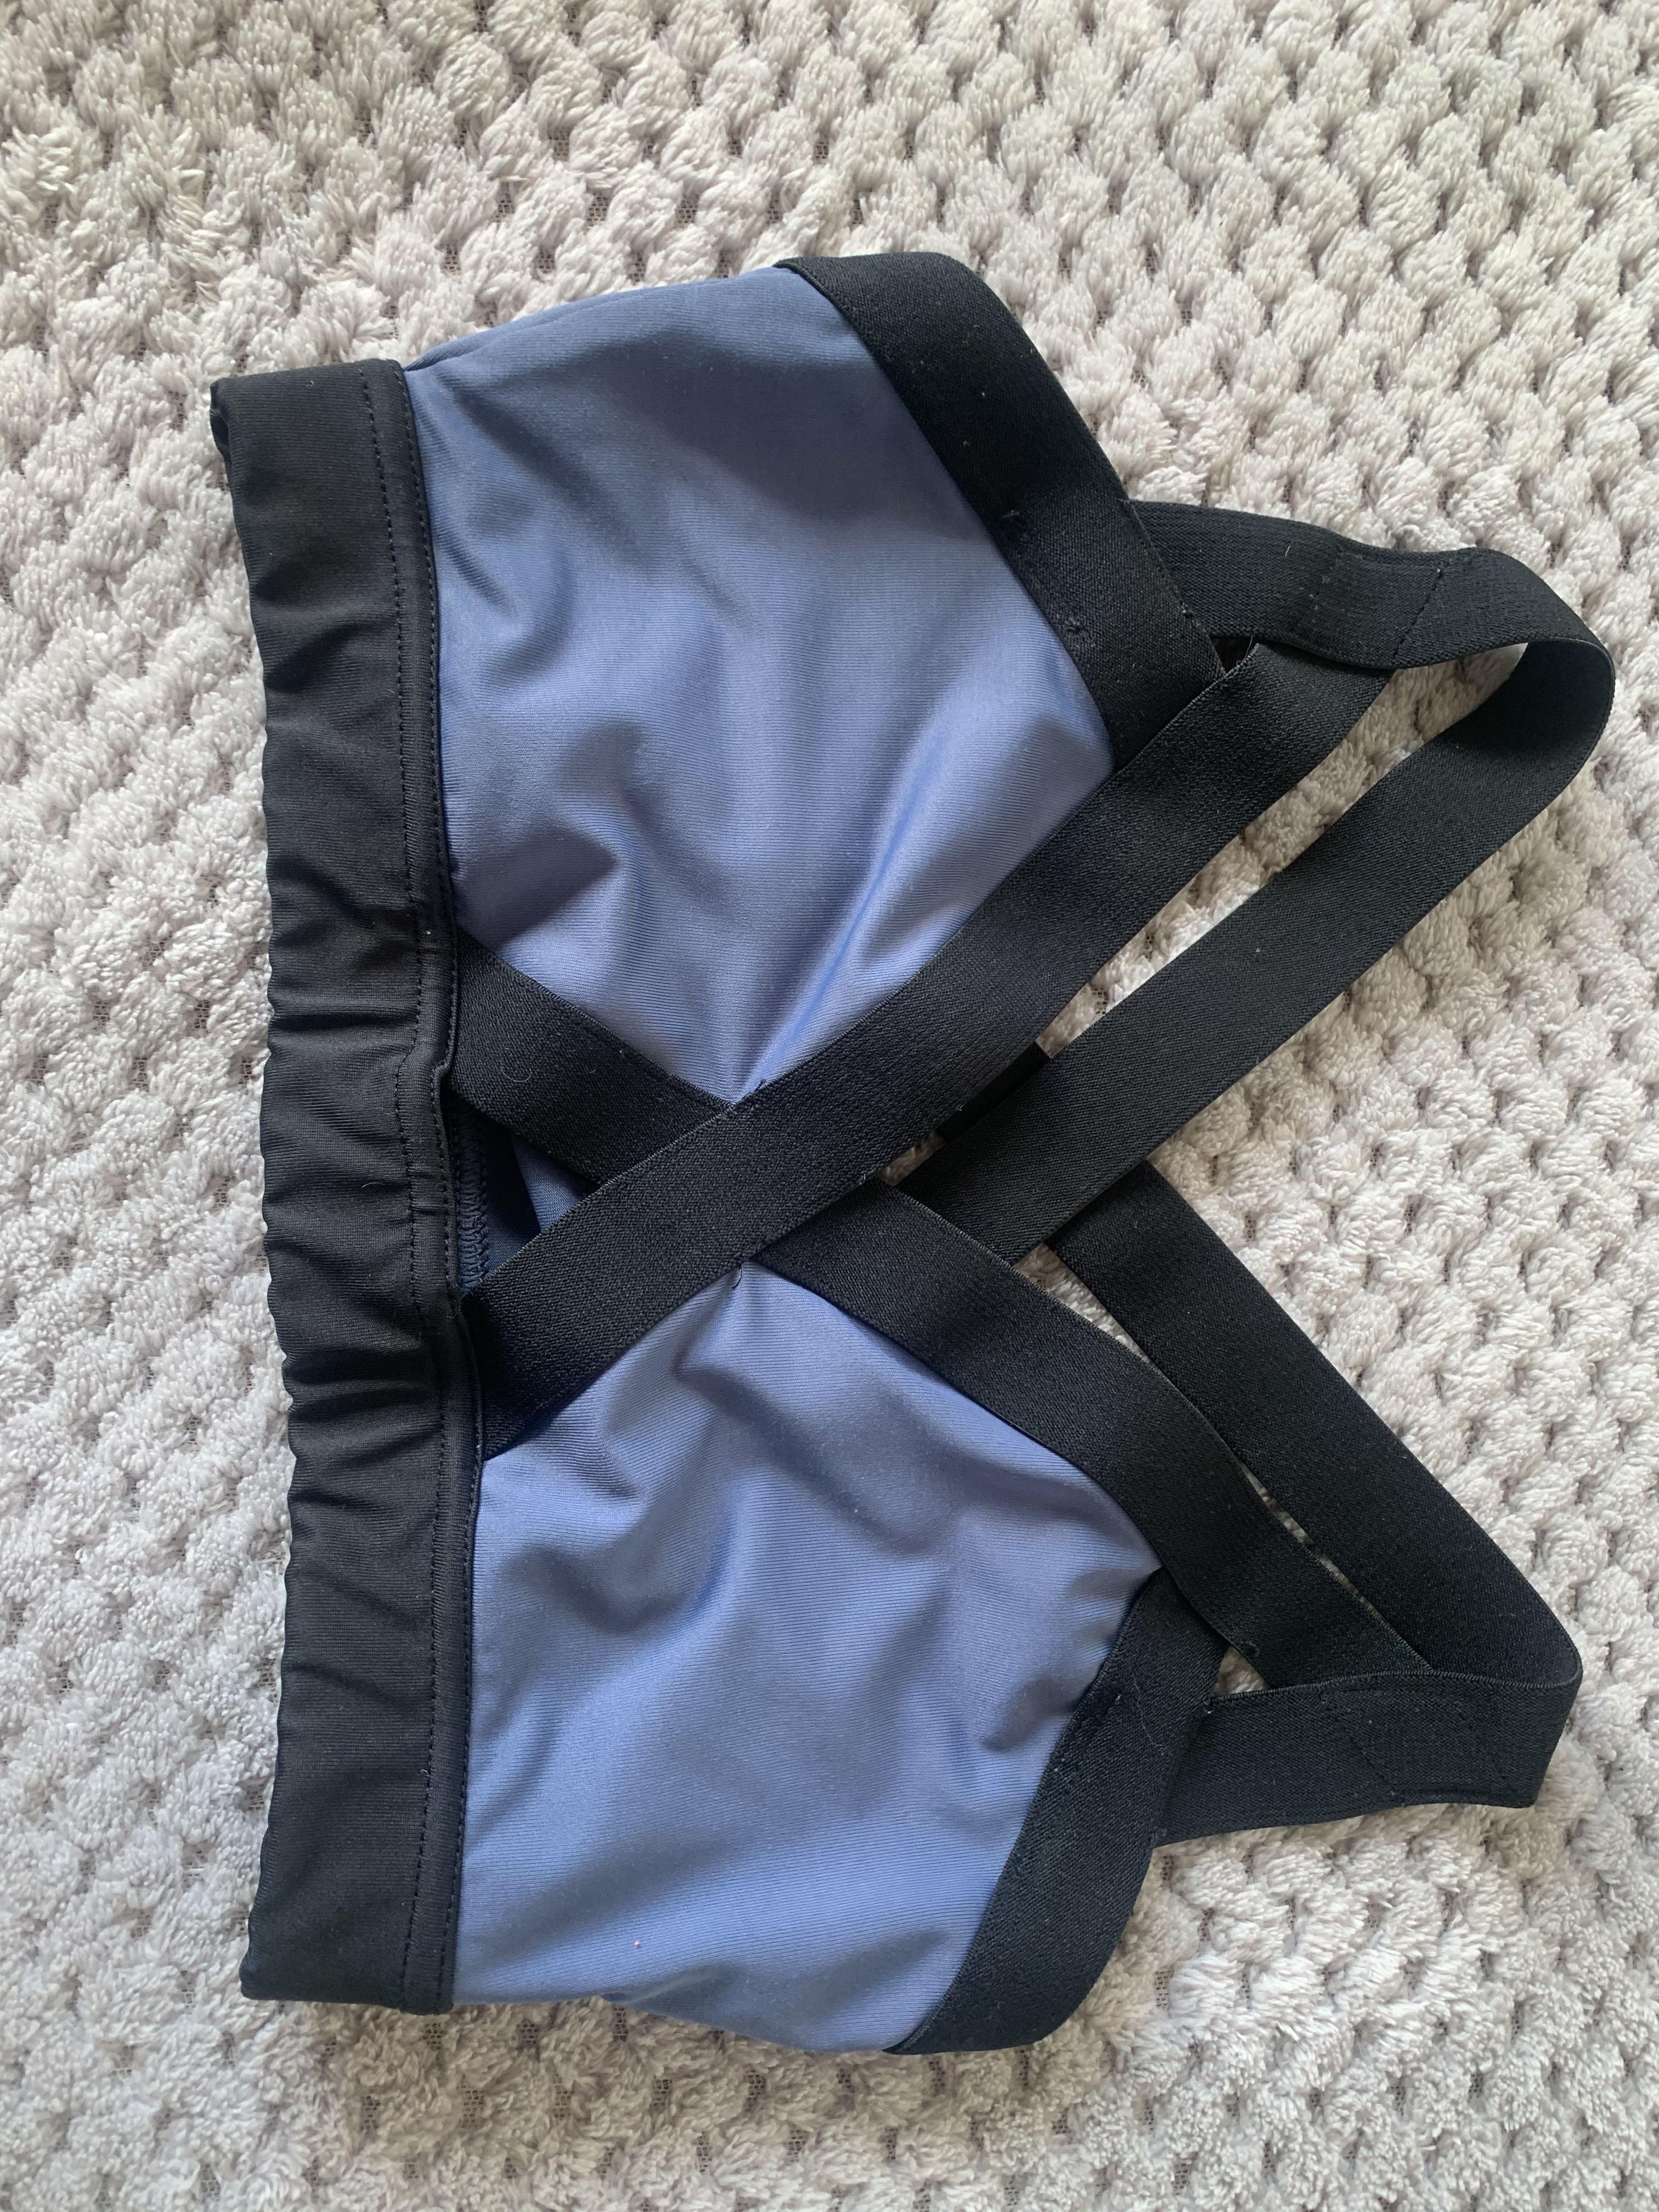 Blue & black crop/sports bra